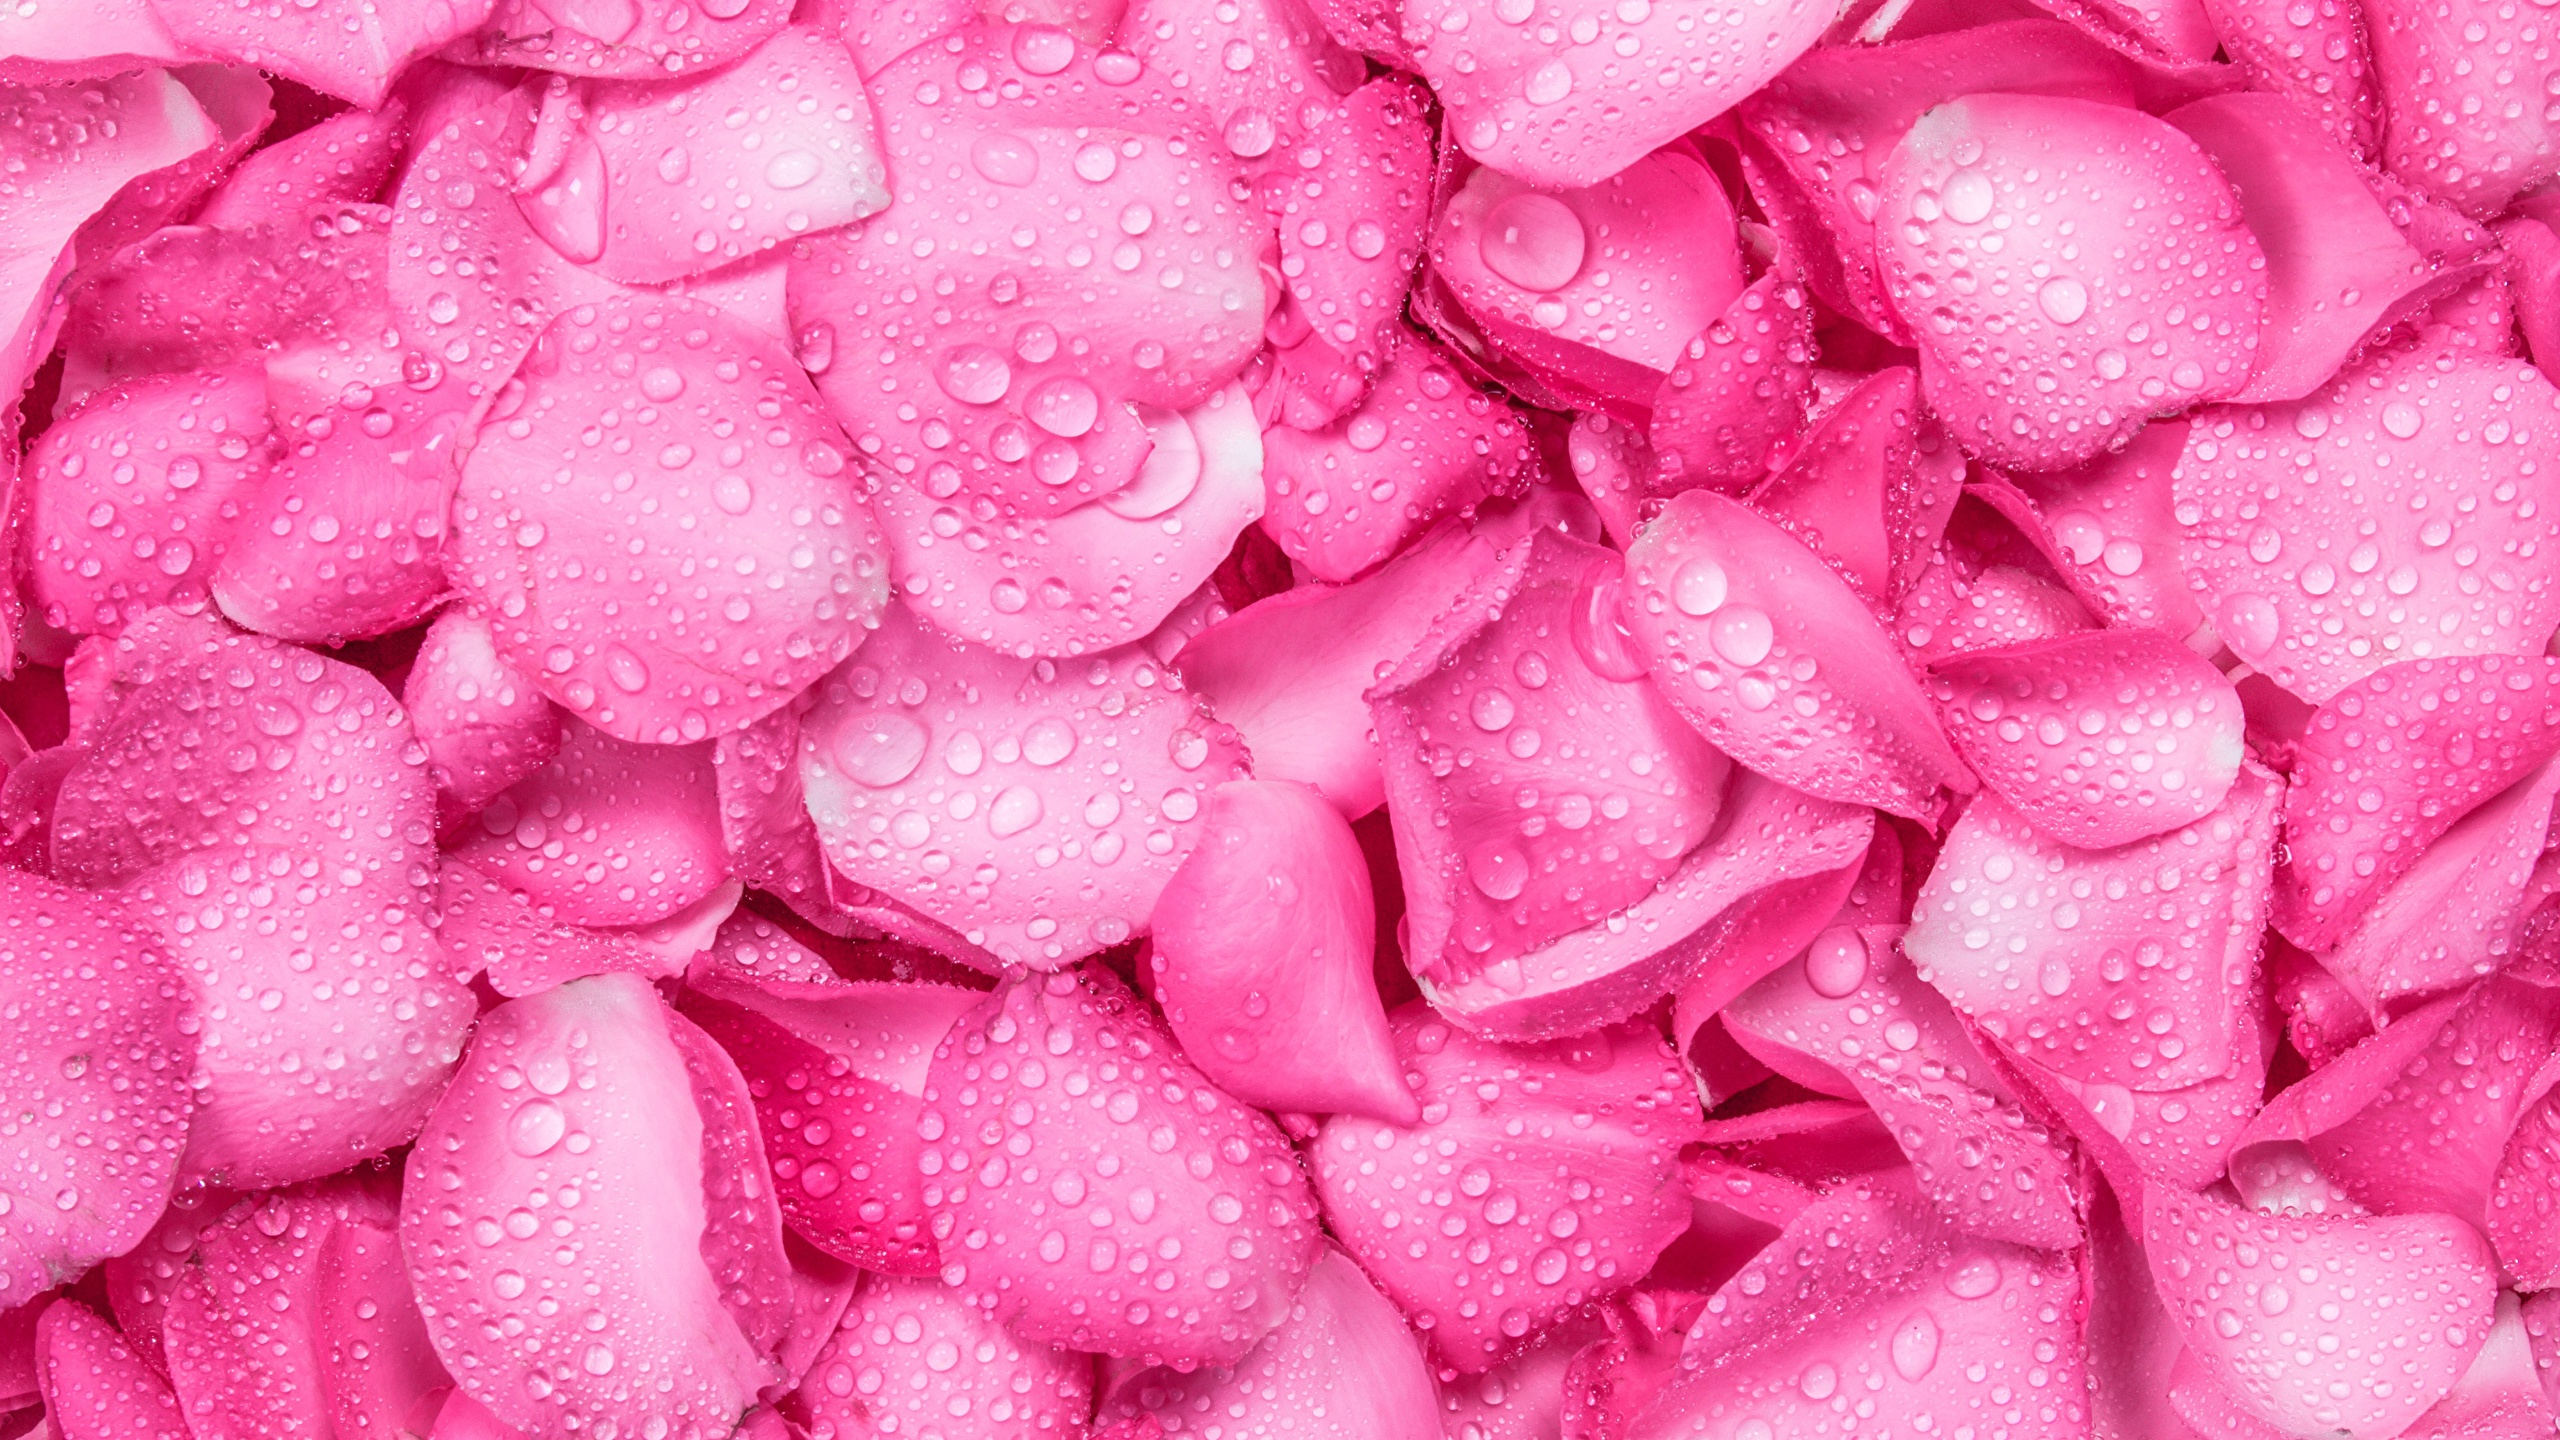 Desktop Wallpapers Rose Pink Color Drops Flower 2560x1440